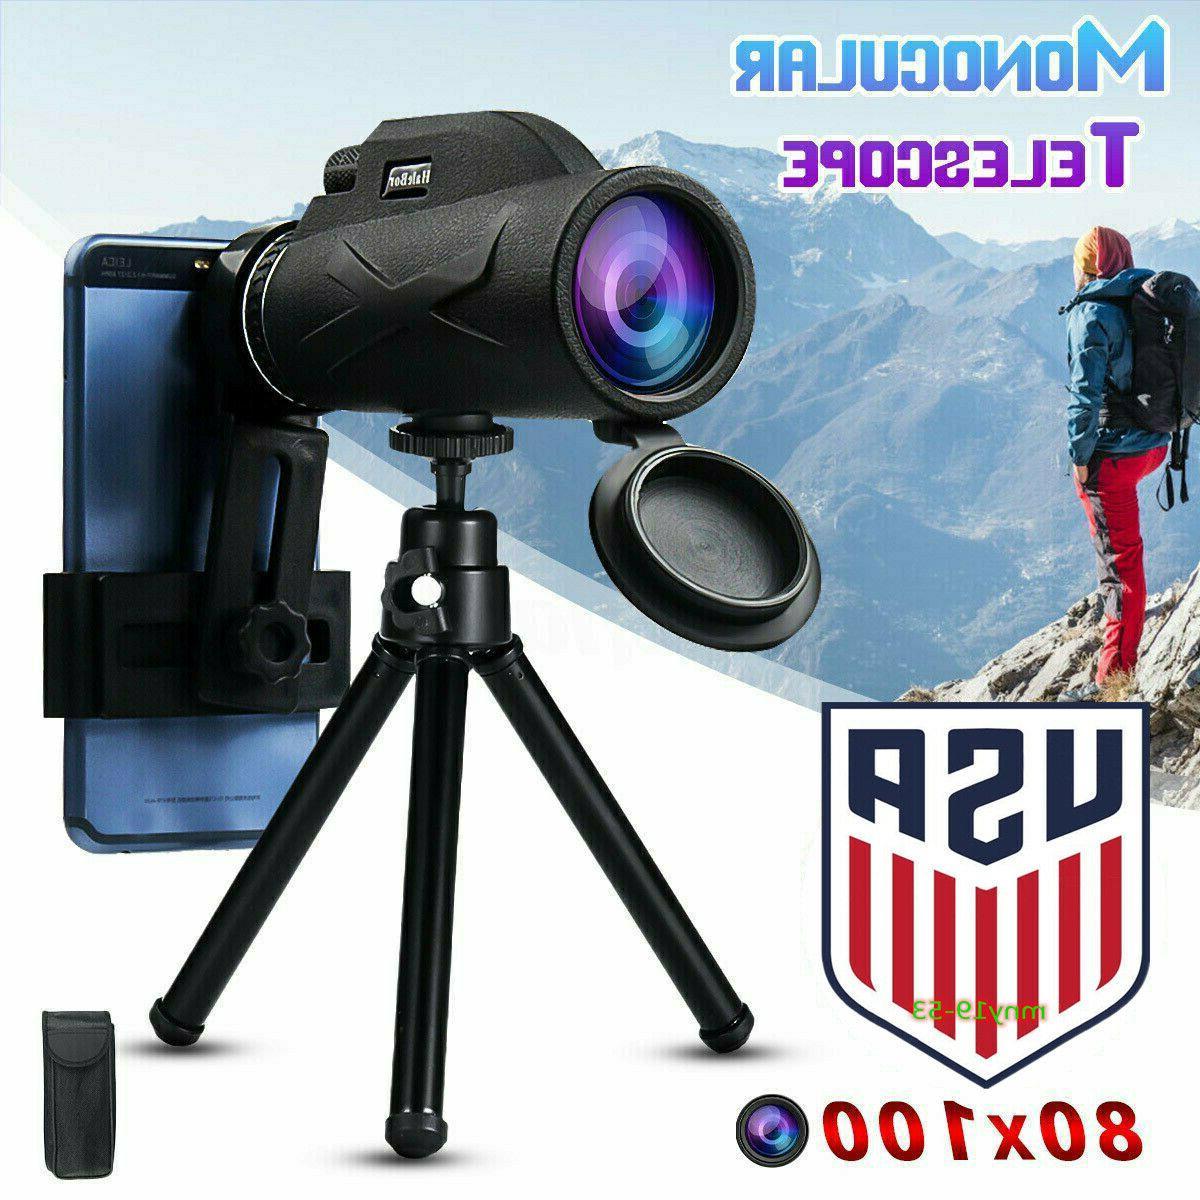 usa hd monocular starscope phone camera zoom